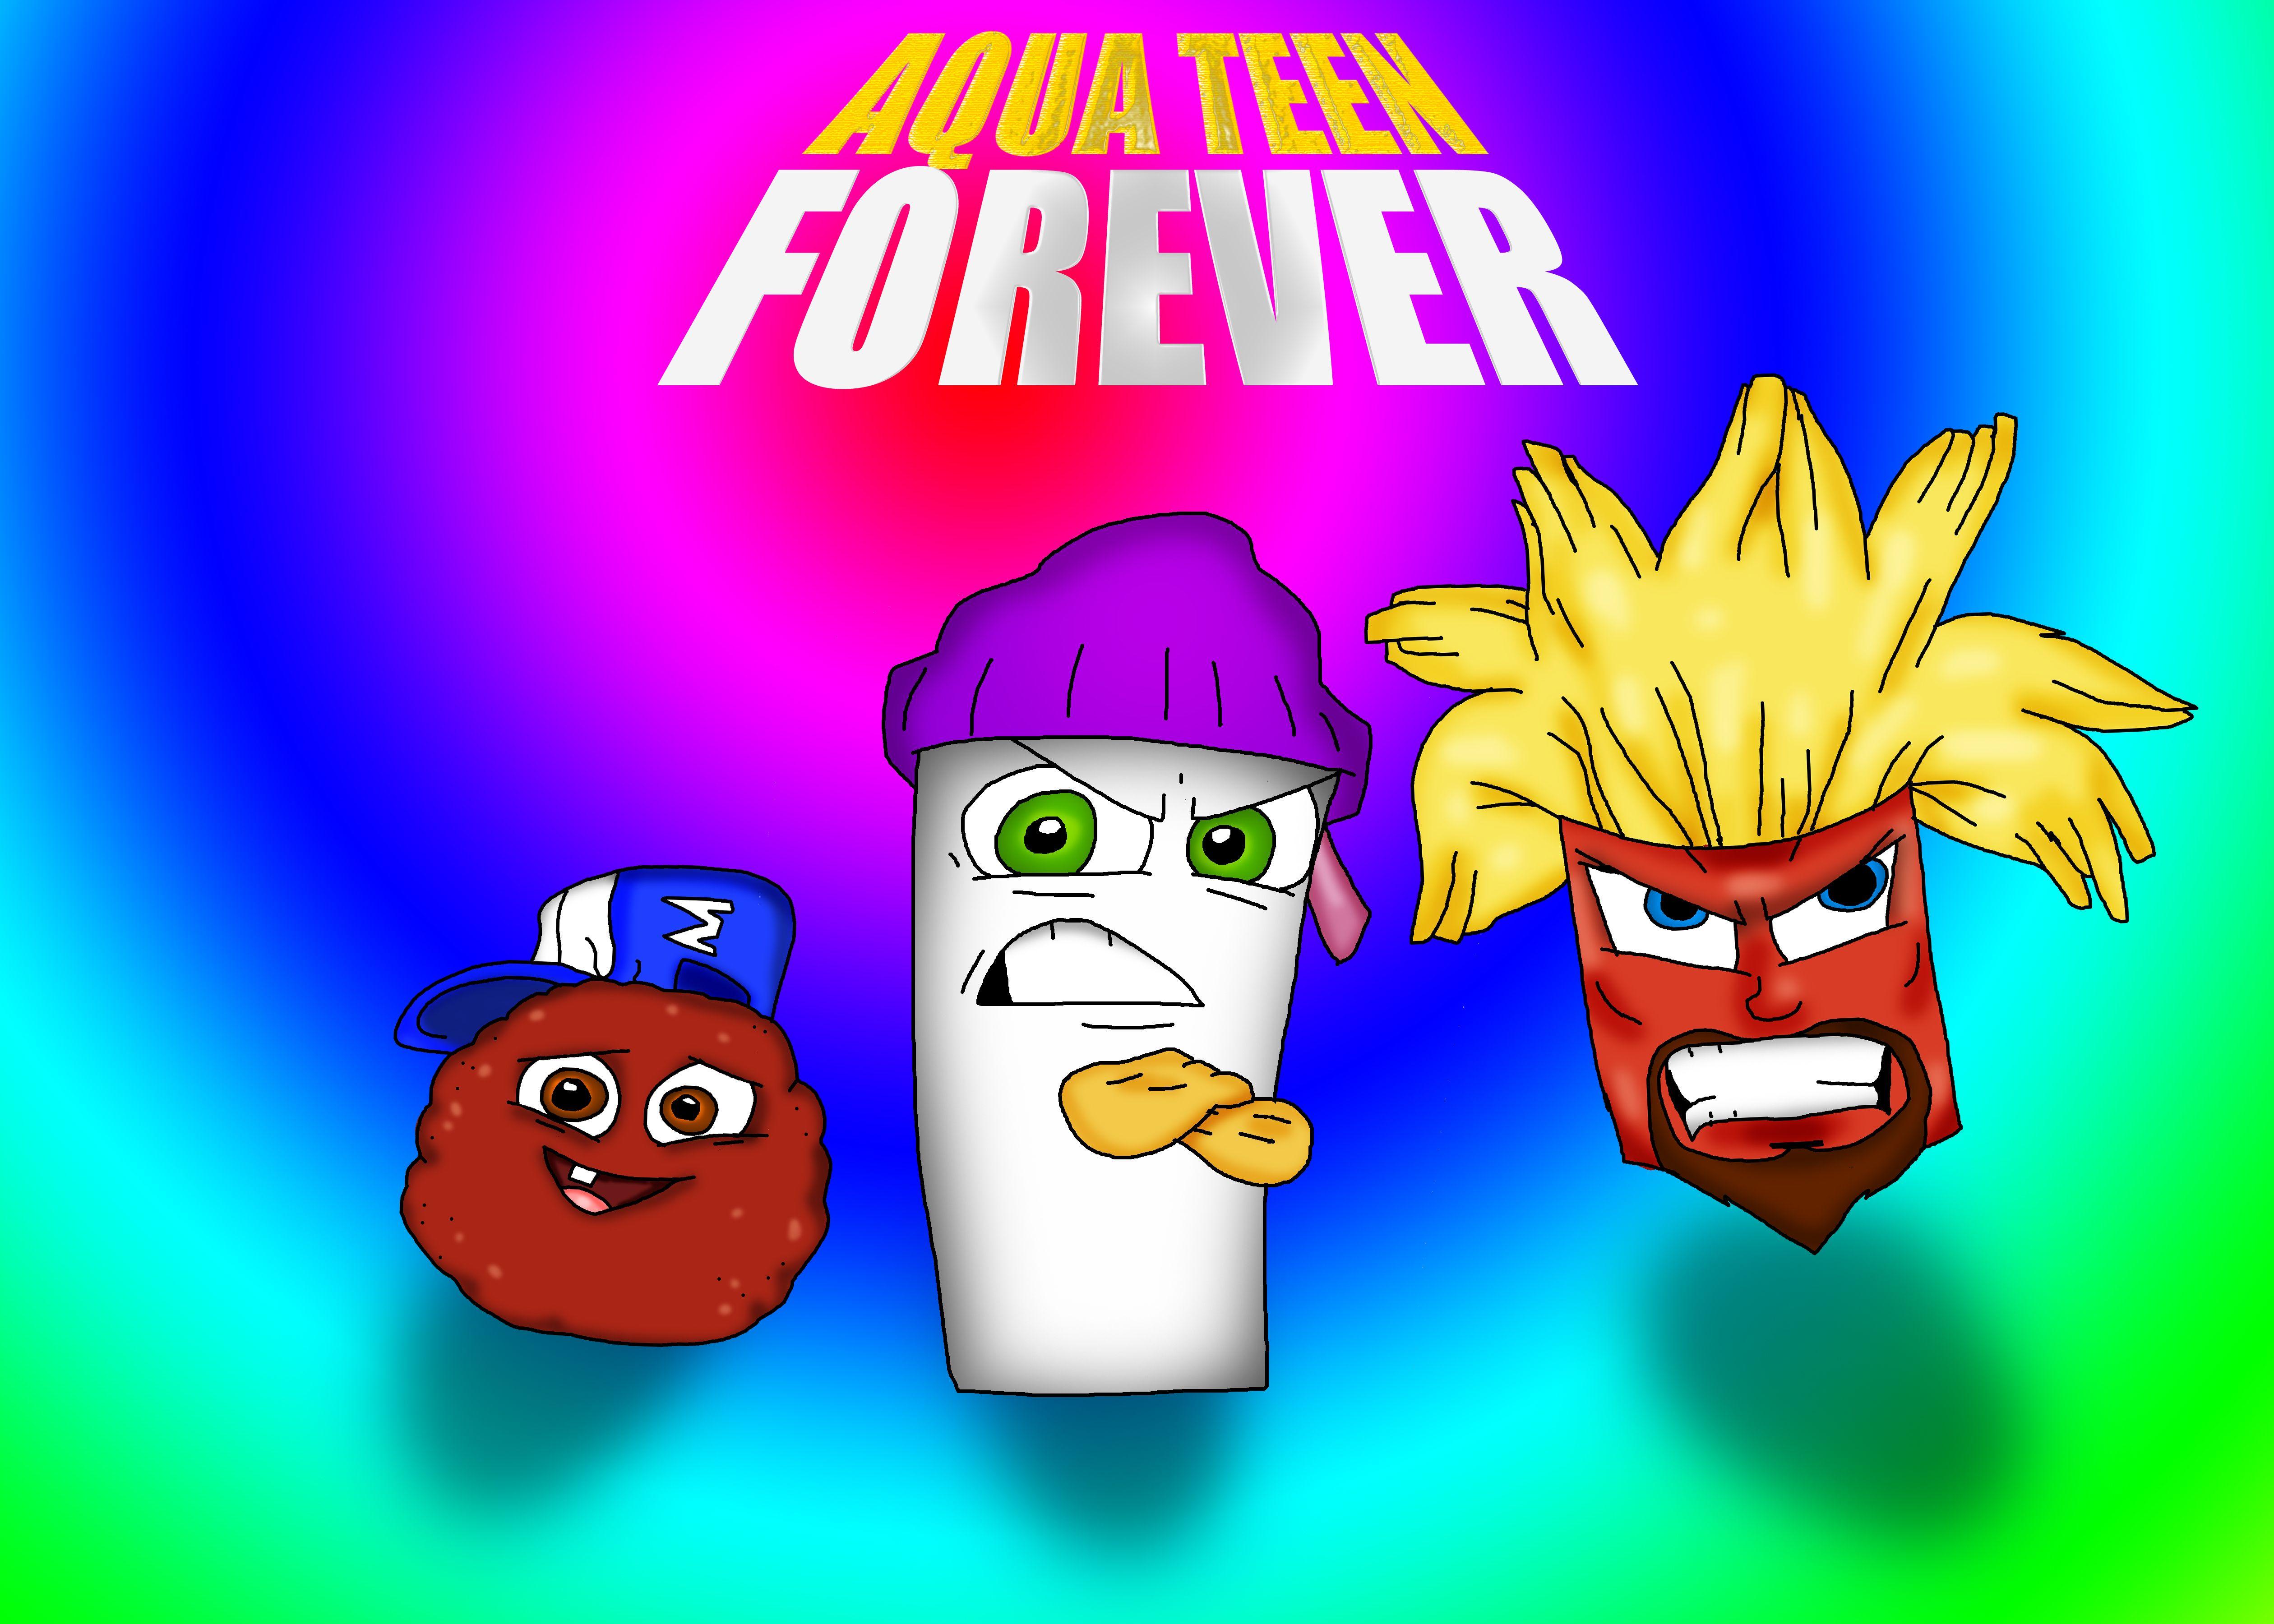 Pin On Aqua Teen Hunger Force